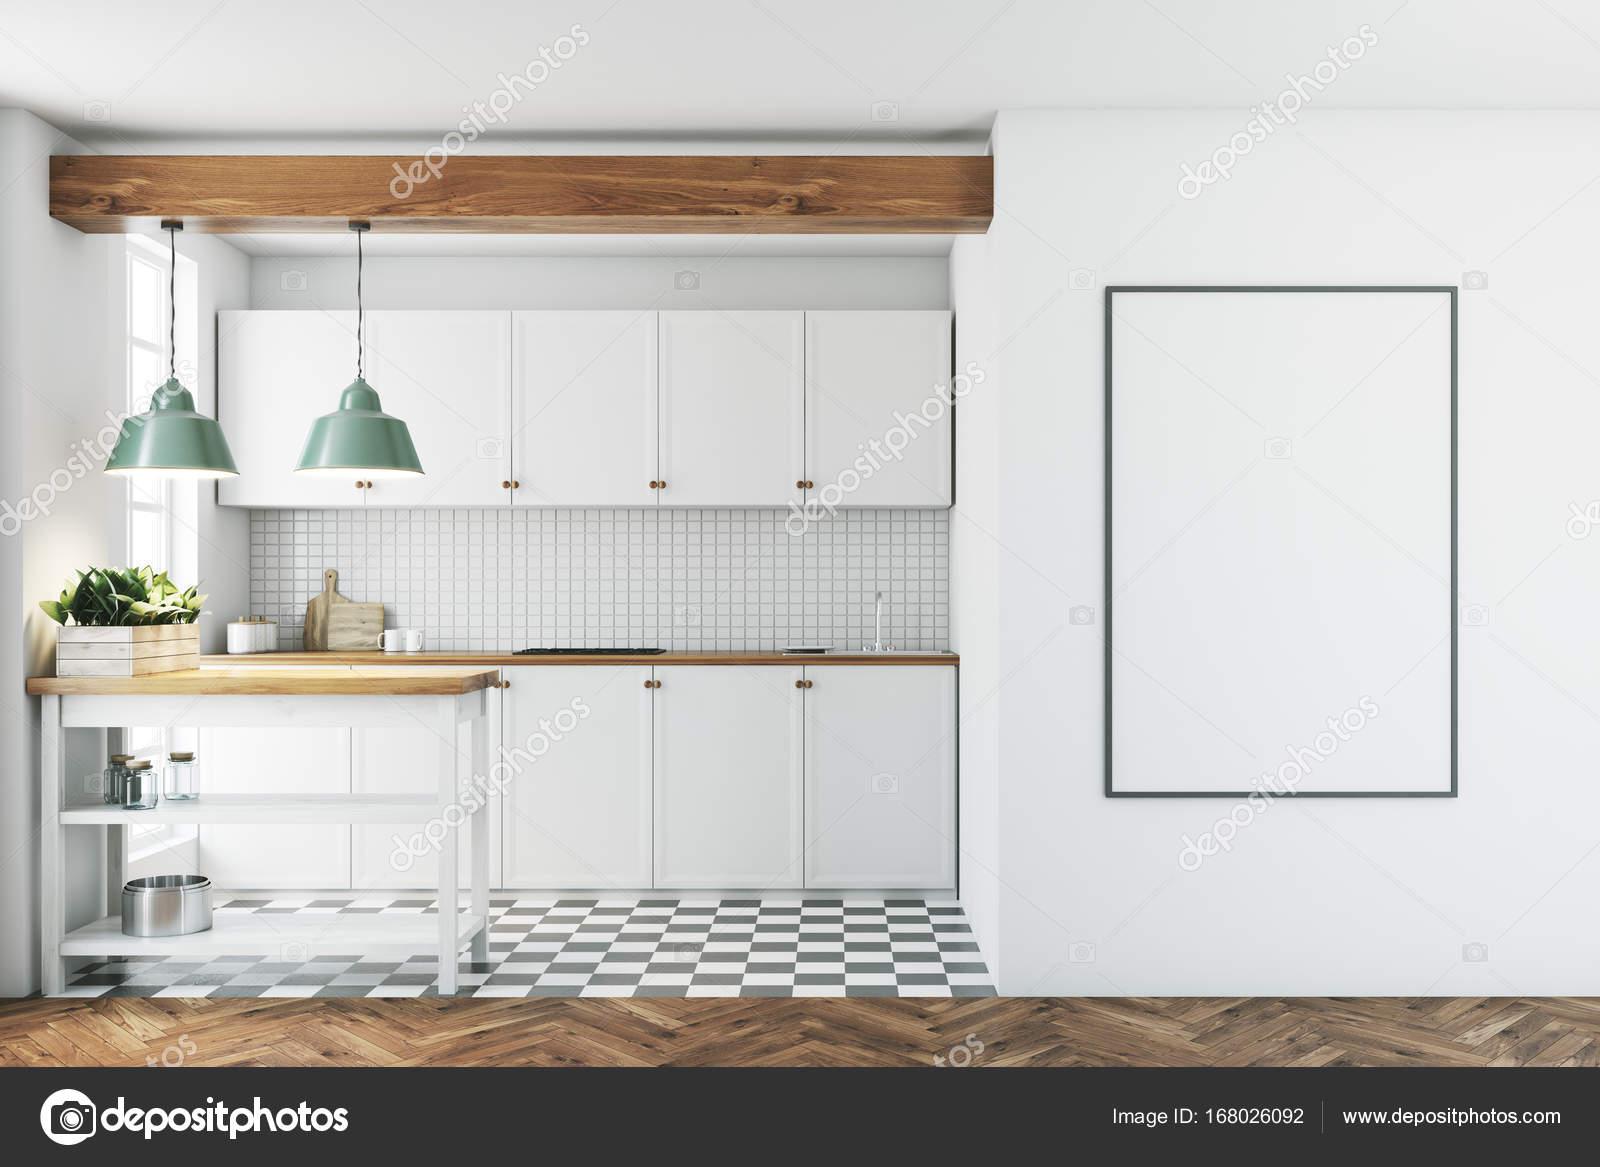 Cucina bianca interni piastrelle pavimento poster u foto stock